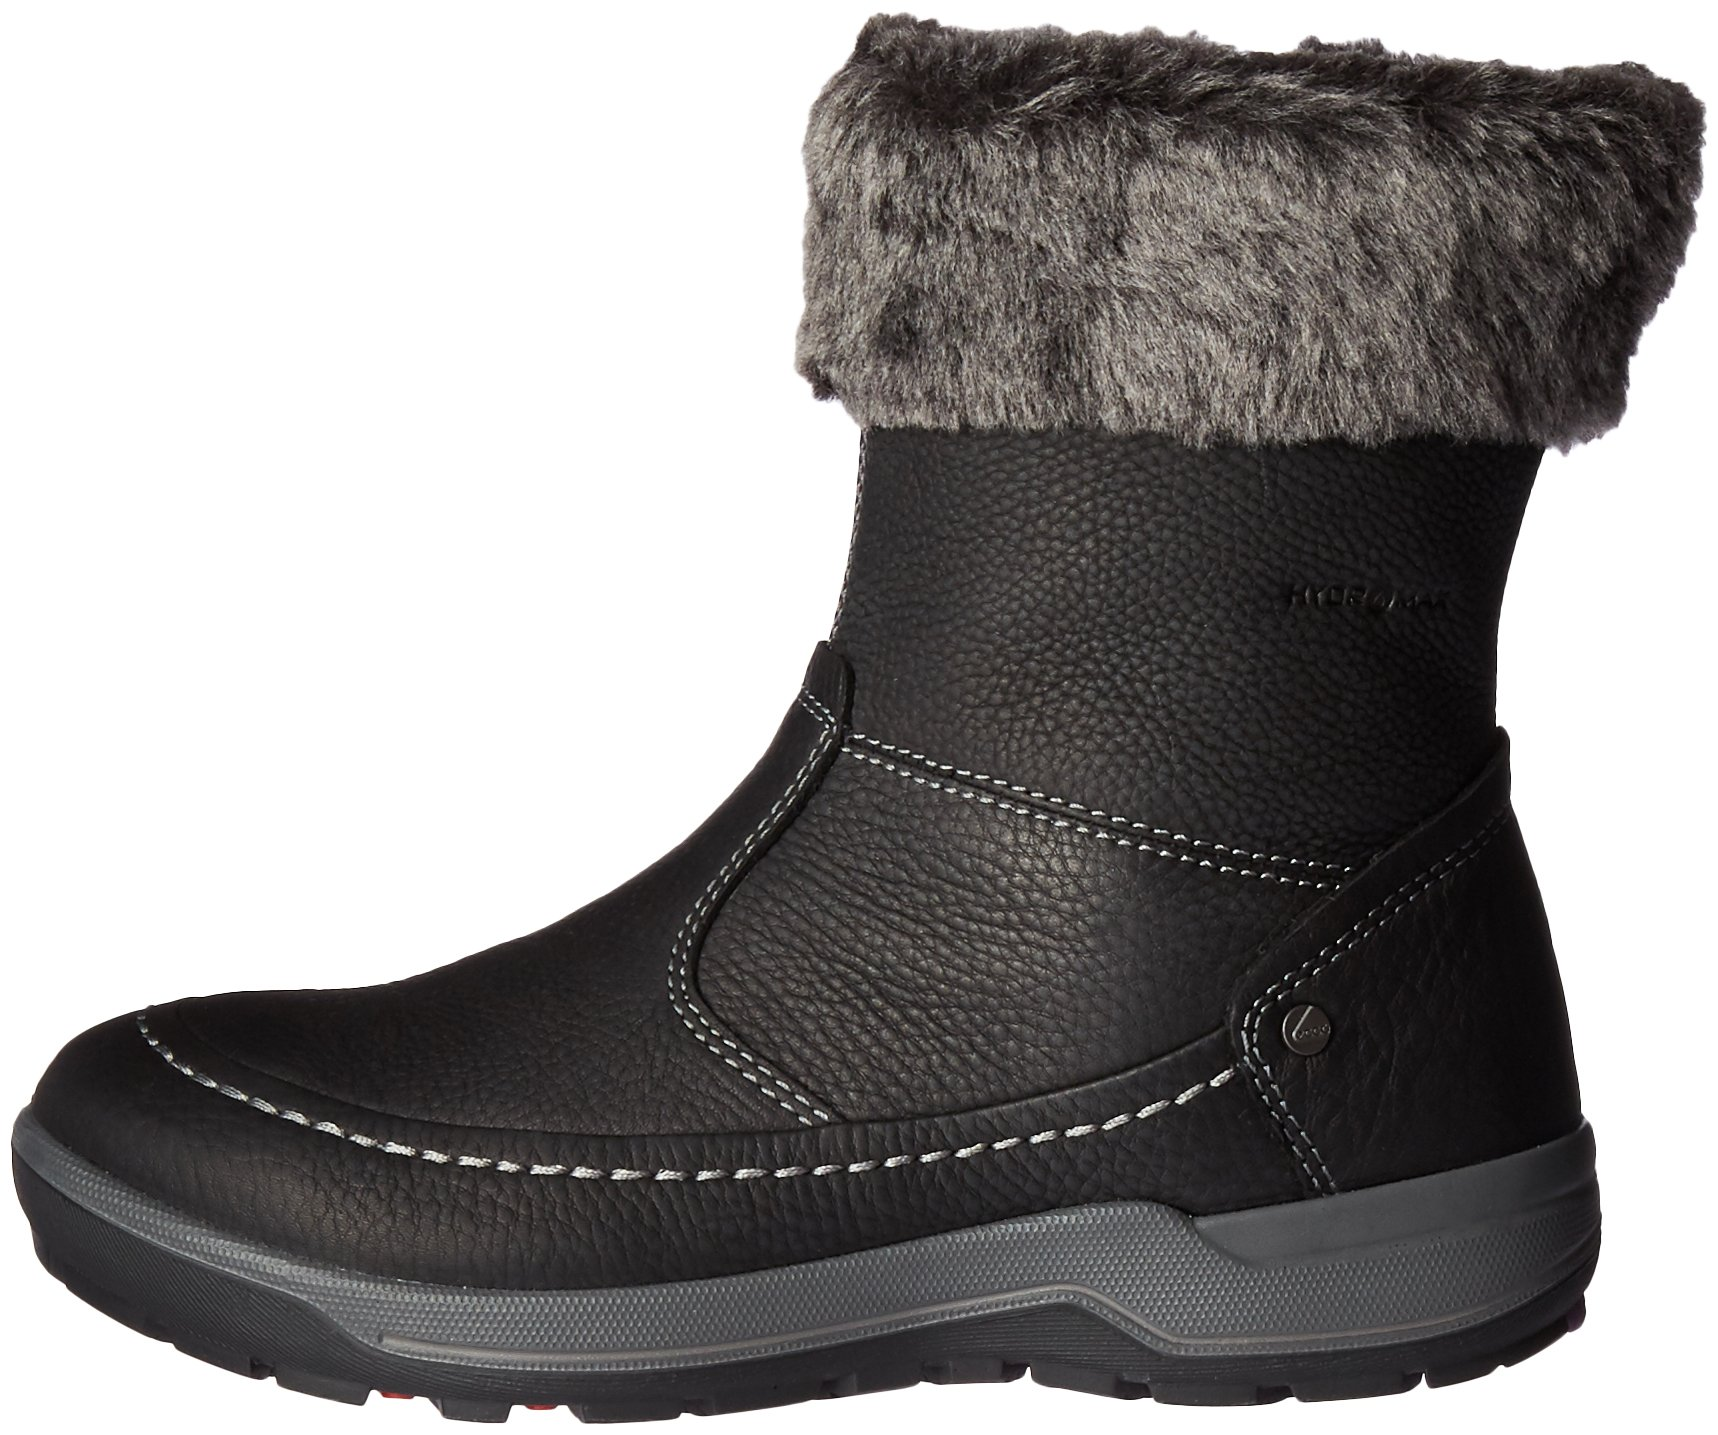 81OZLBzdqOL - ECCO Women's Trace Boot-w Multisport Outdoor Shoes